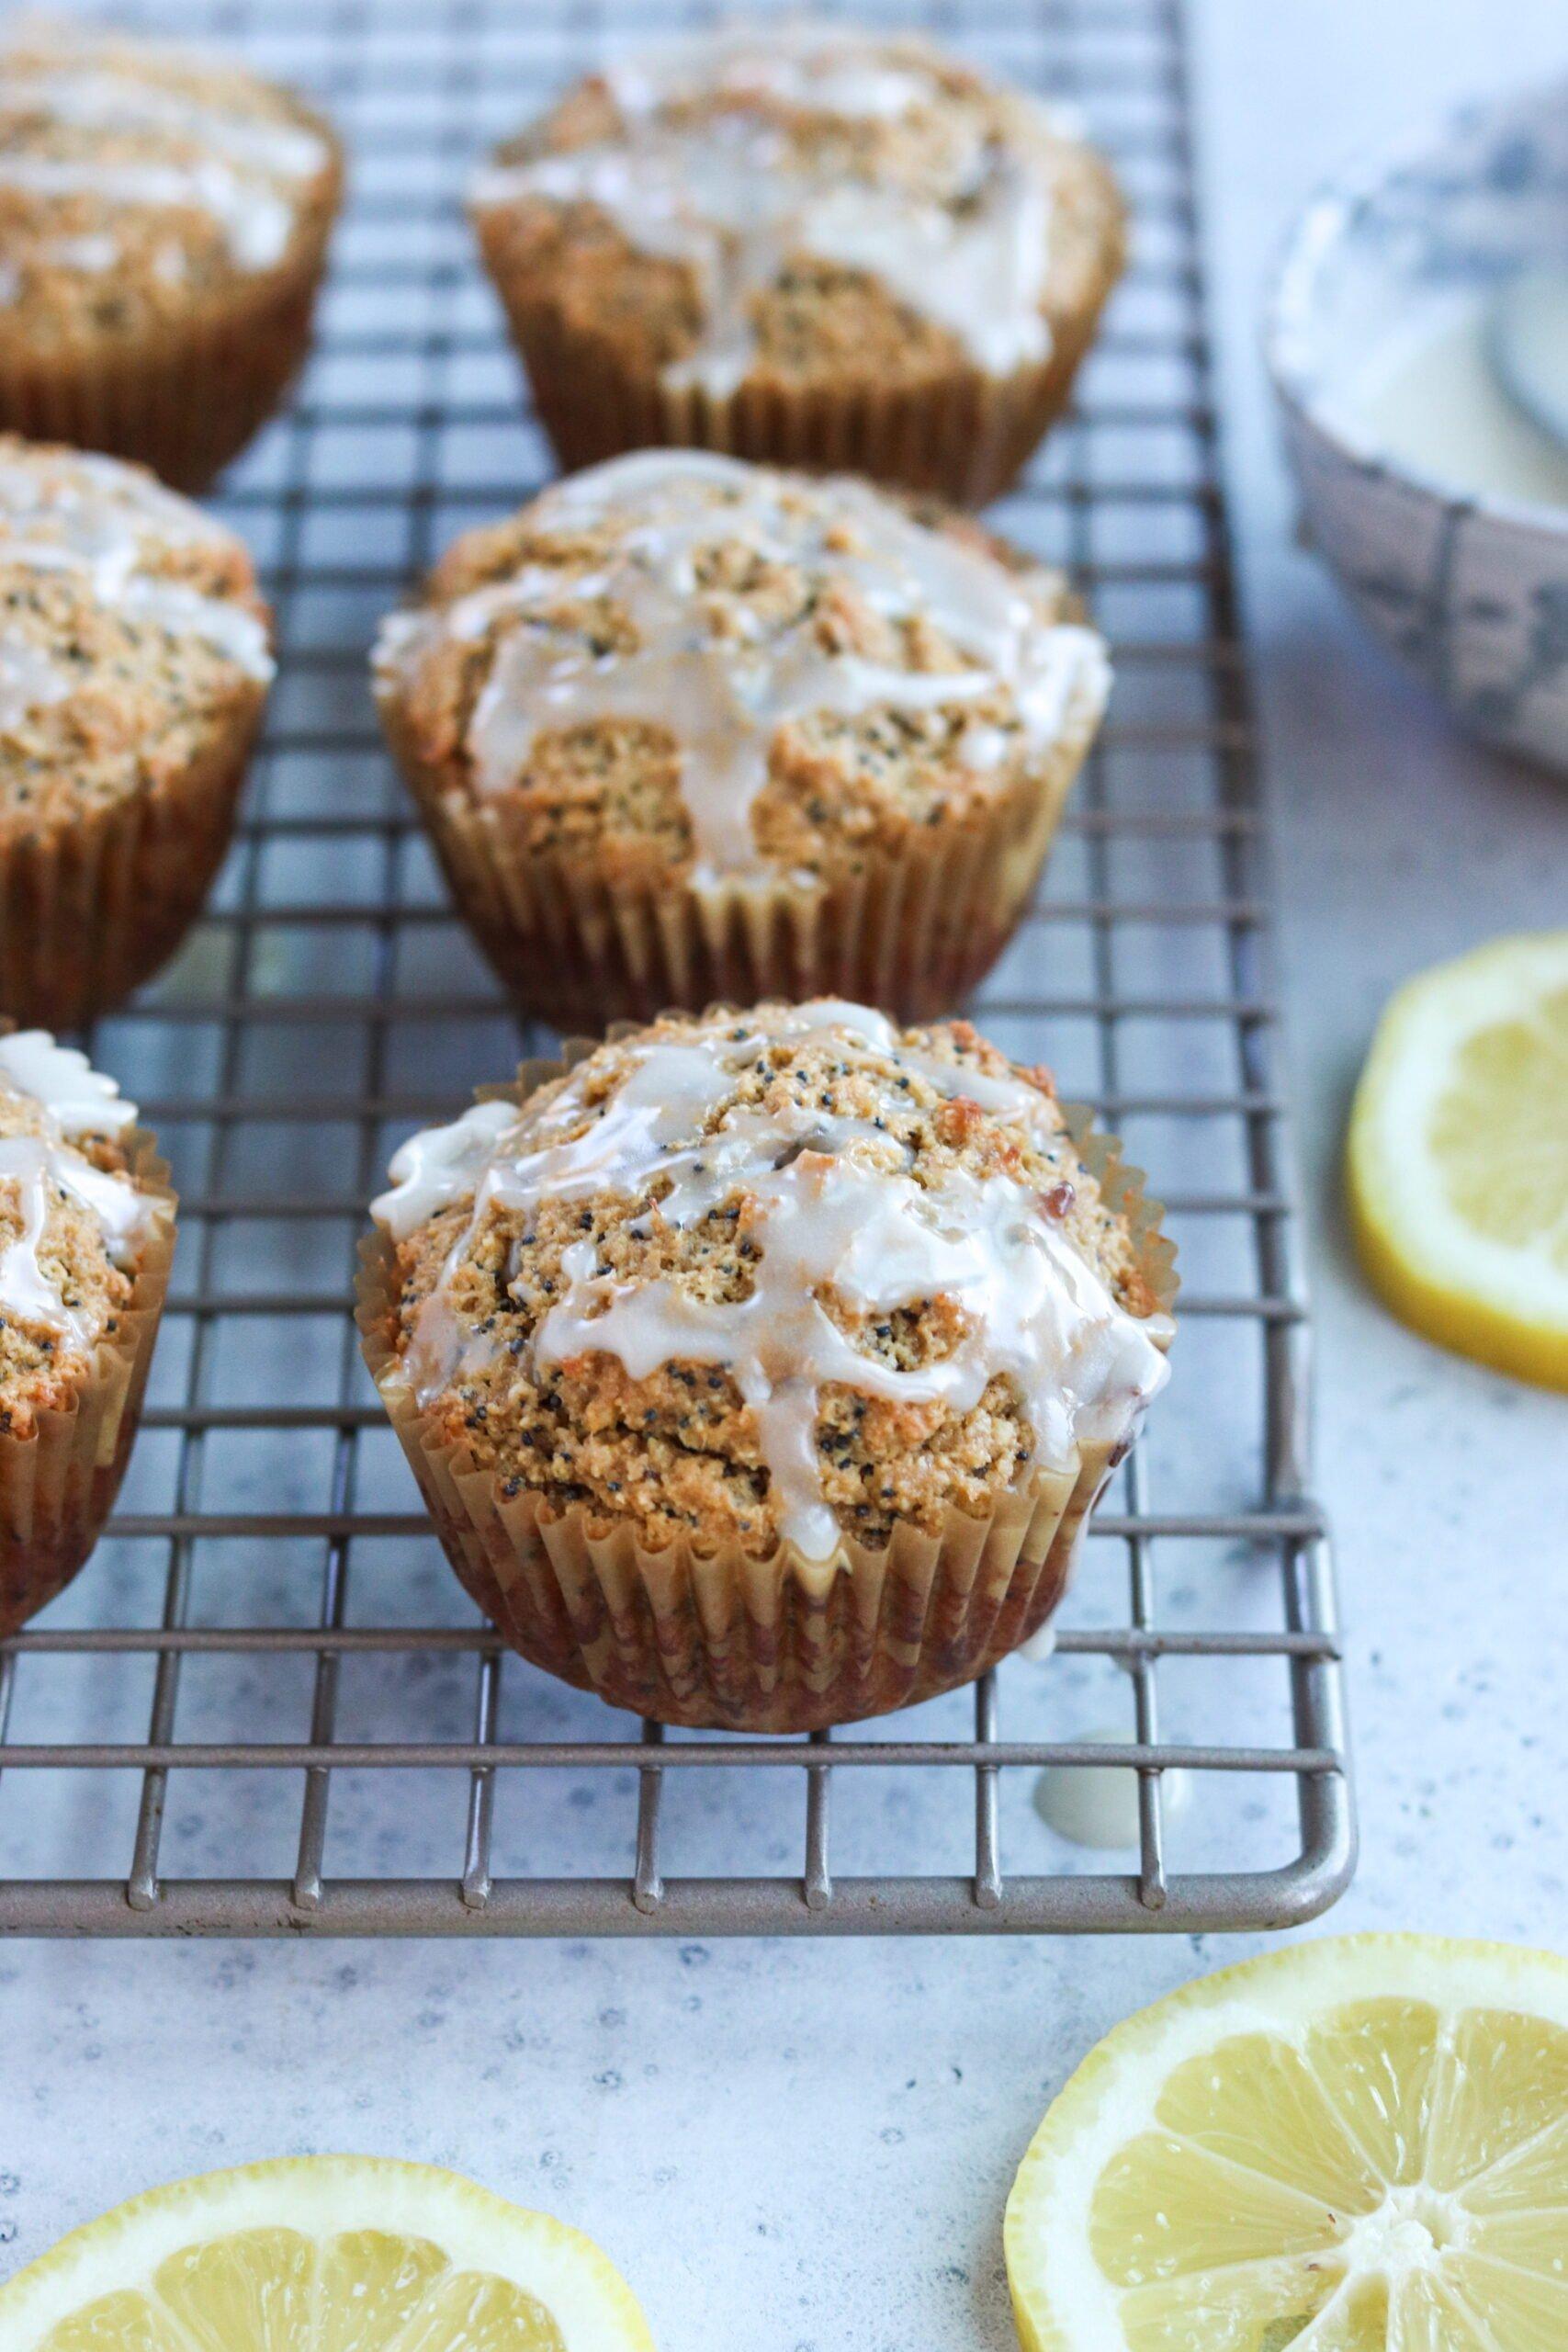 cupcakes and lemon